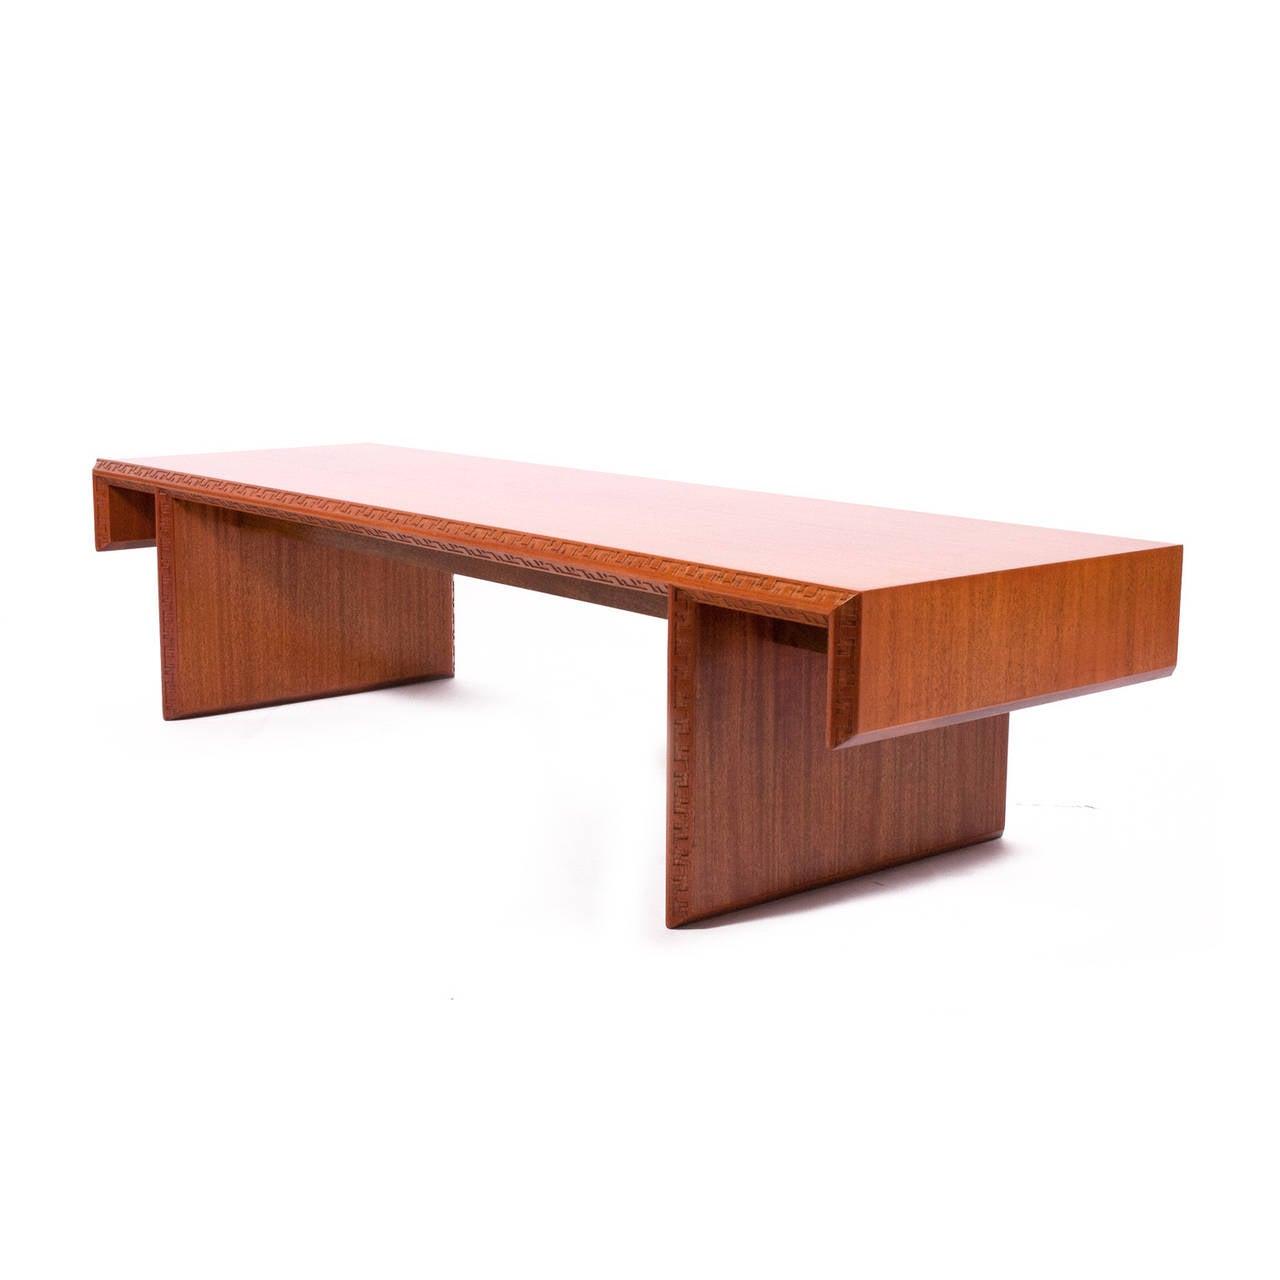 Frank Lloyd Wright Mahogany Coffee Table or Bench at 1stdibs